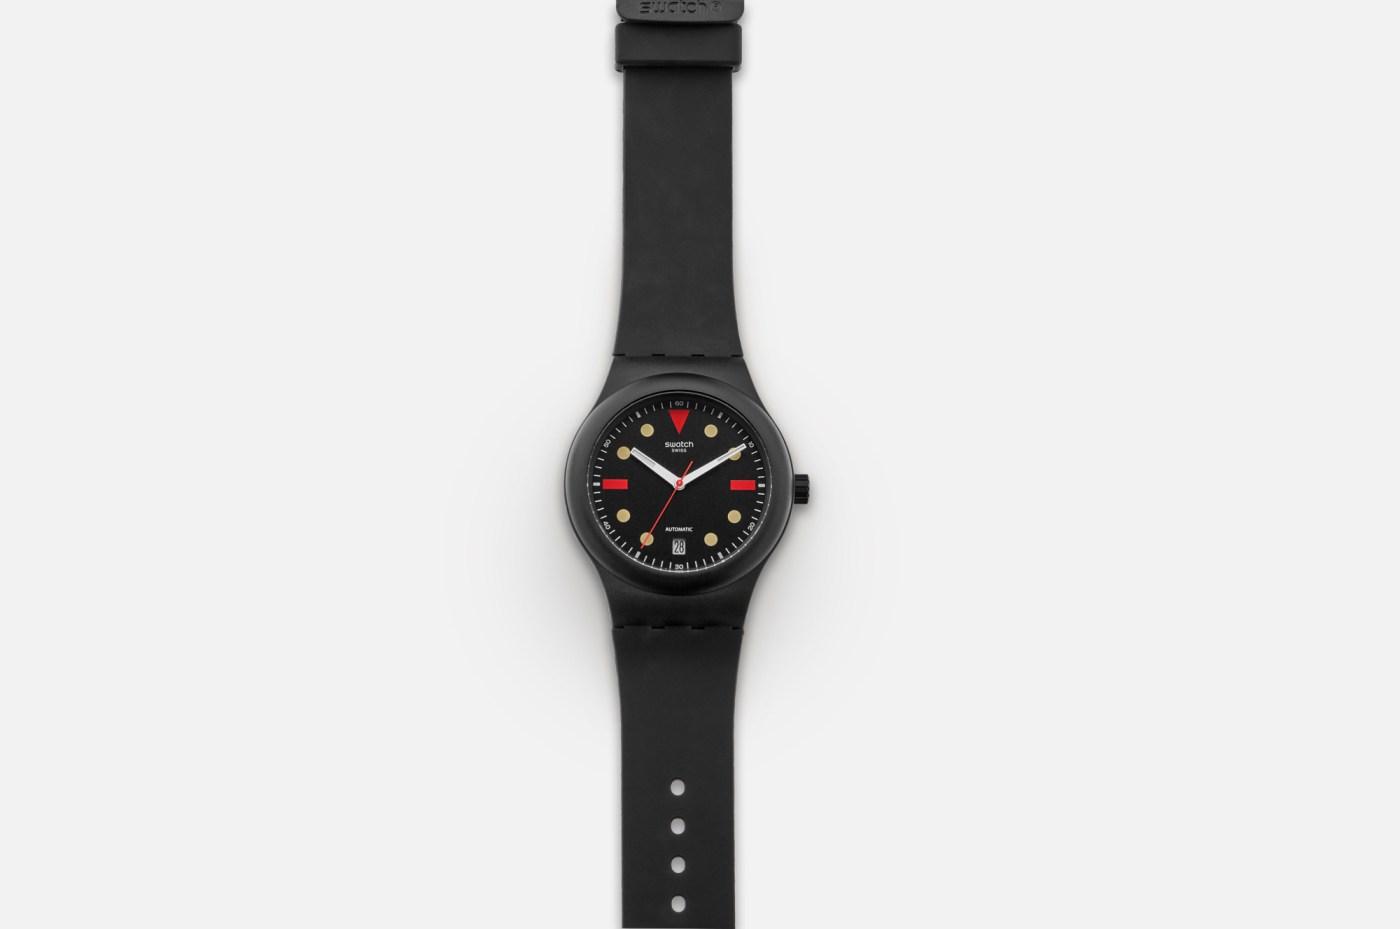 Swatch Sistem51 Hodinkee Generation 1986